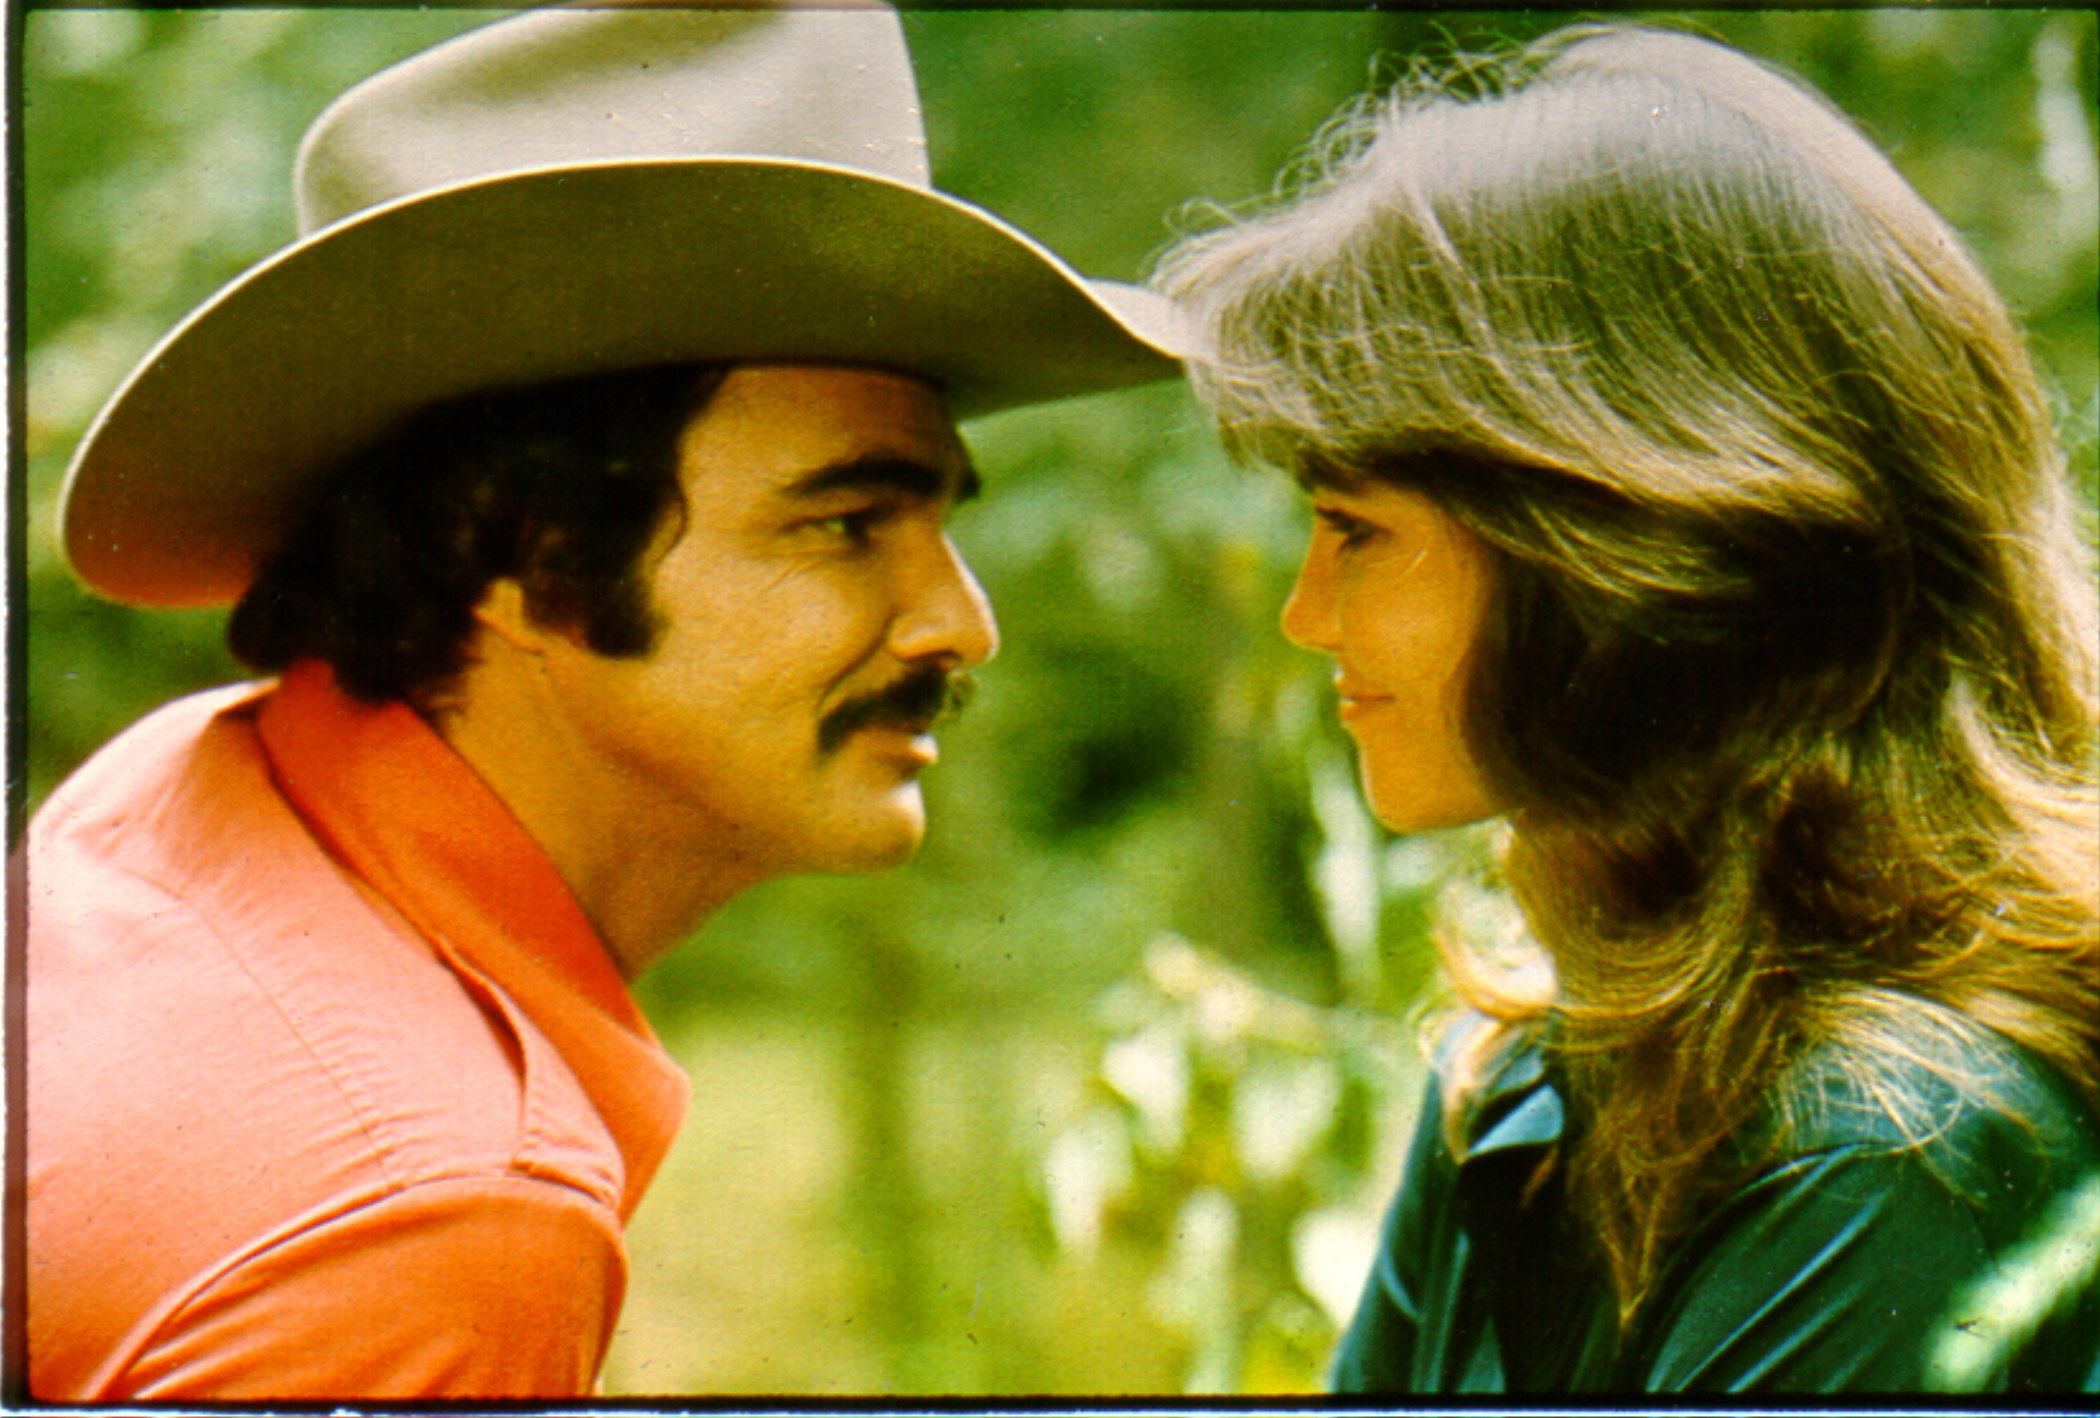 Burt Reynolds Background